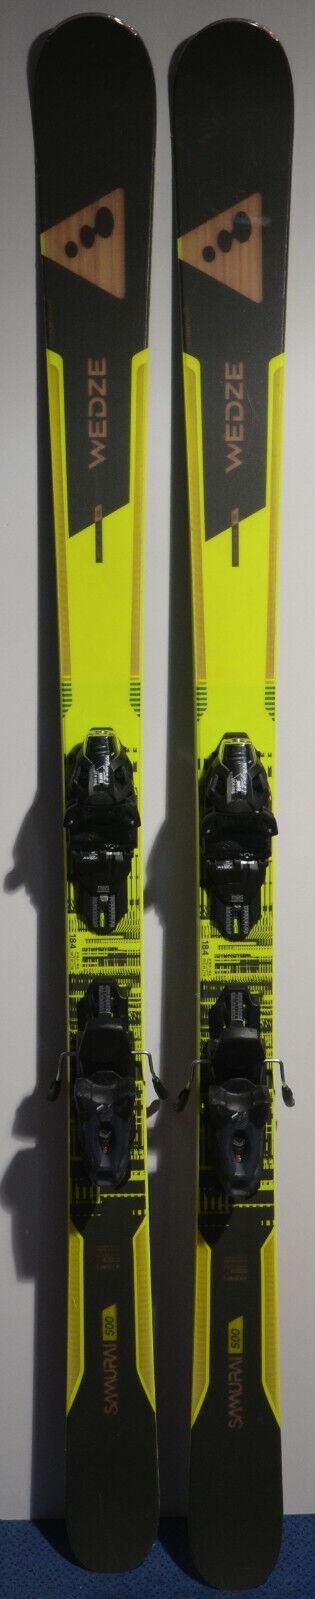 Ski Parabolic used WED 'ZE Samurai 500 + bindings 184cm Model 18